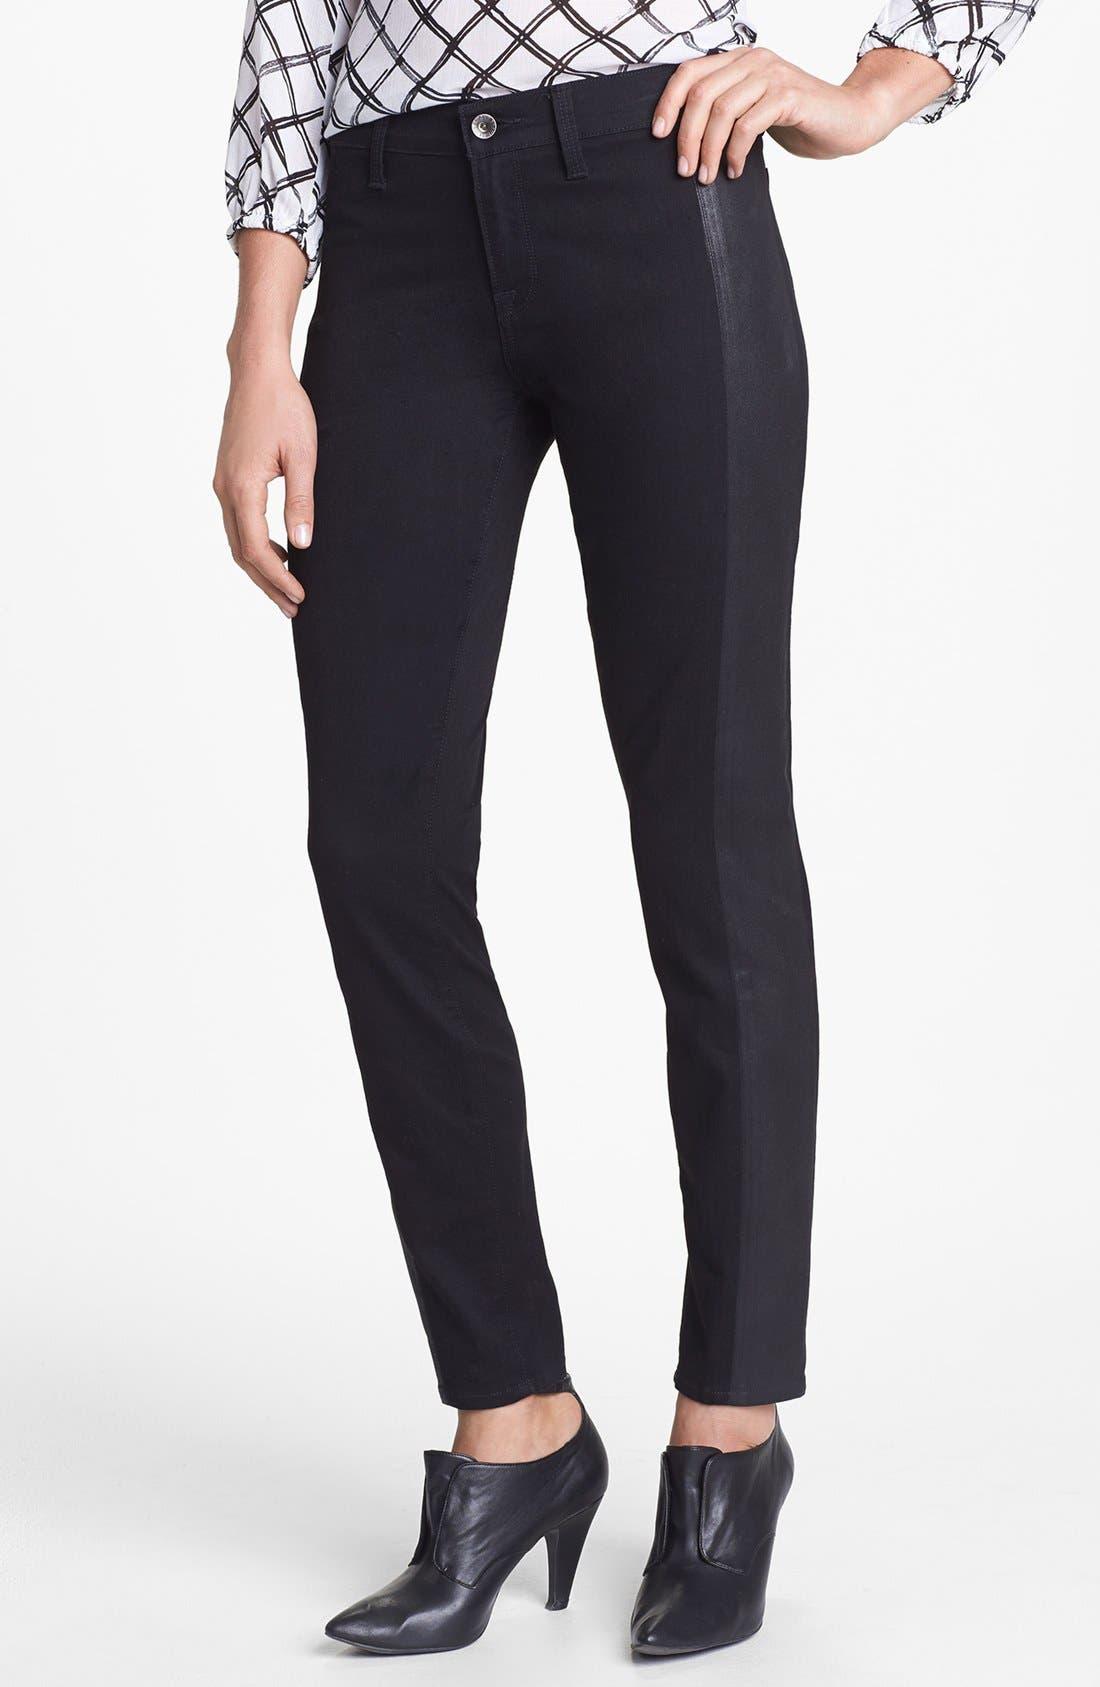 Alternate Image 1 Selected - Lucky Brand 'Sofia' Tuxedo Detail Skinny Jeans (Jededia)